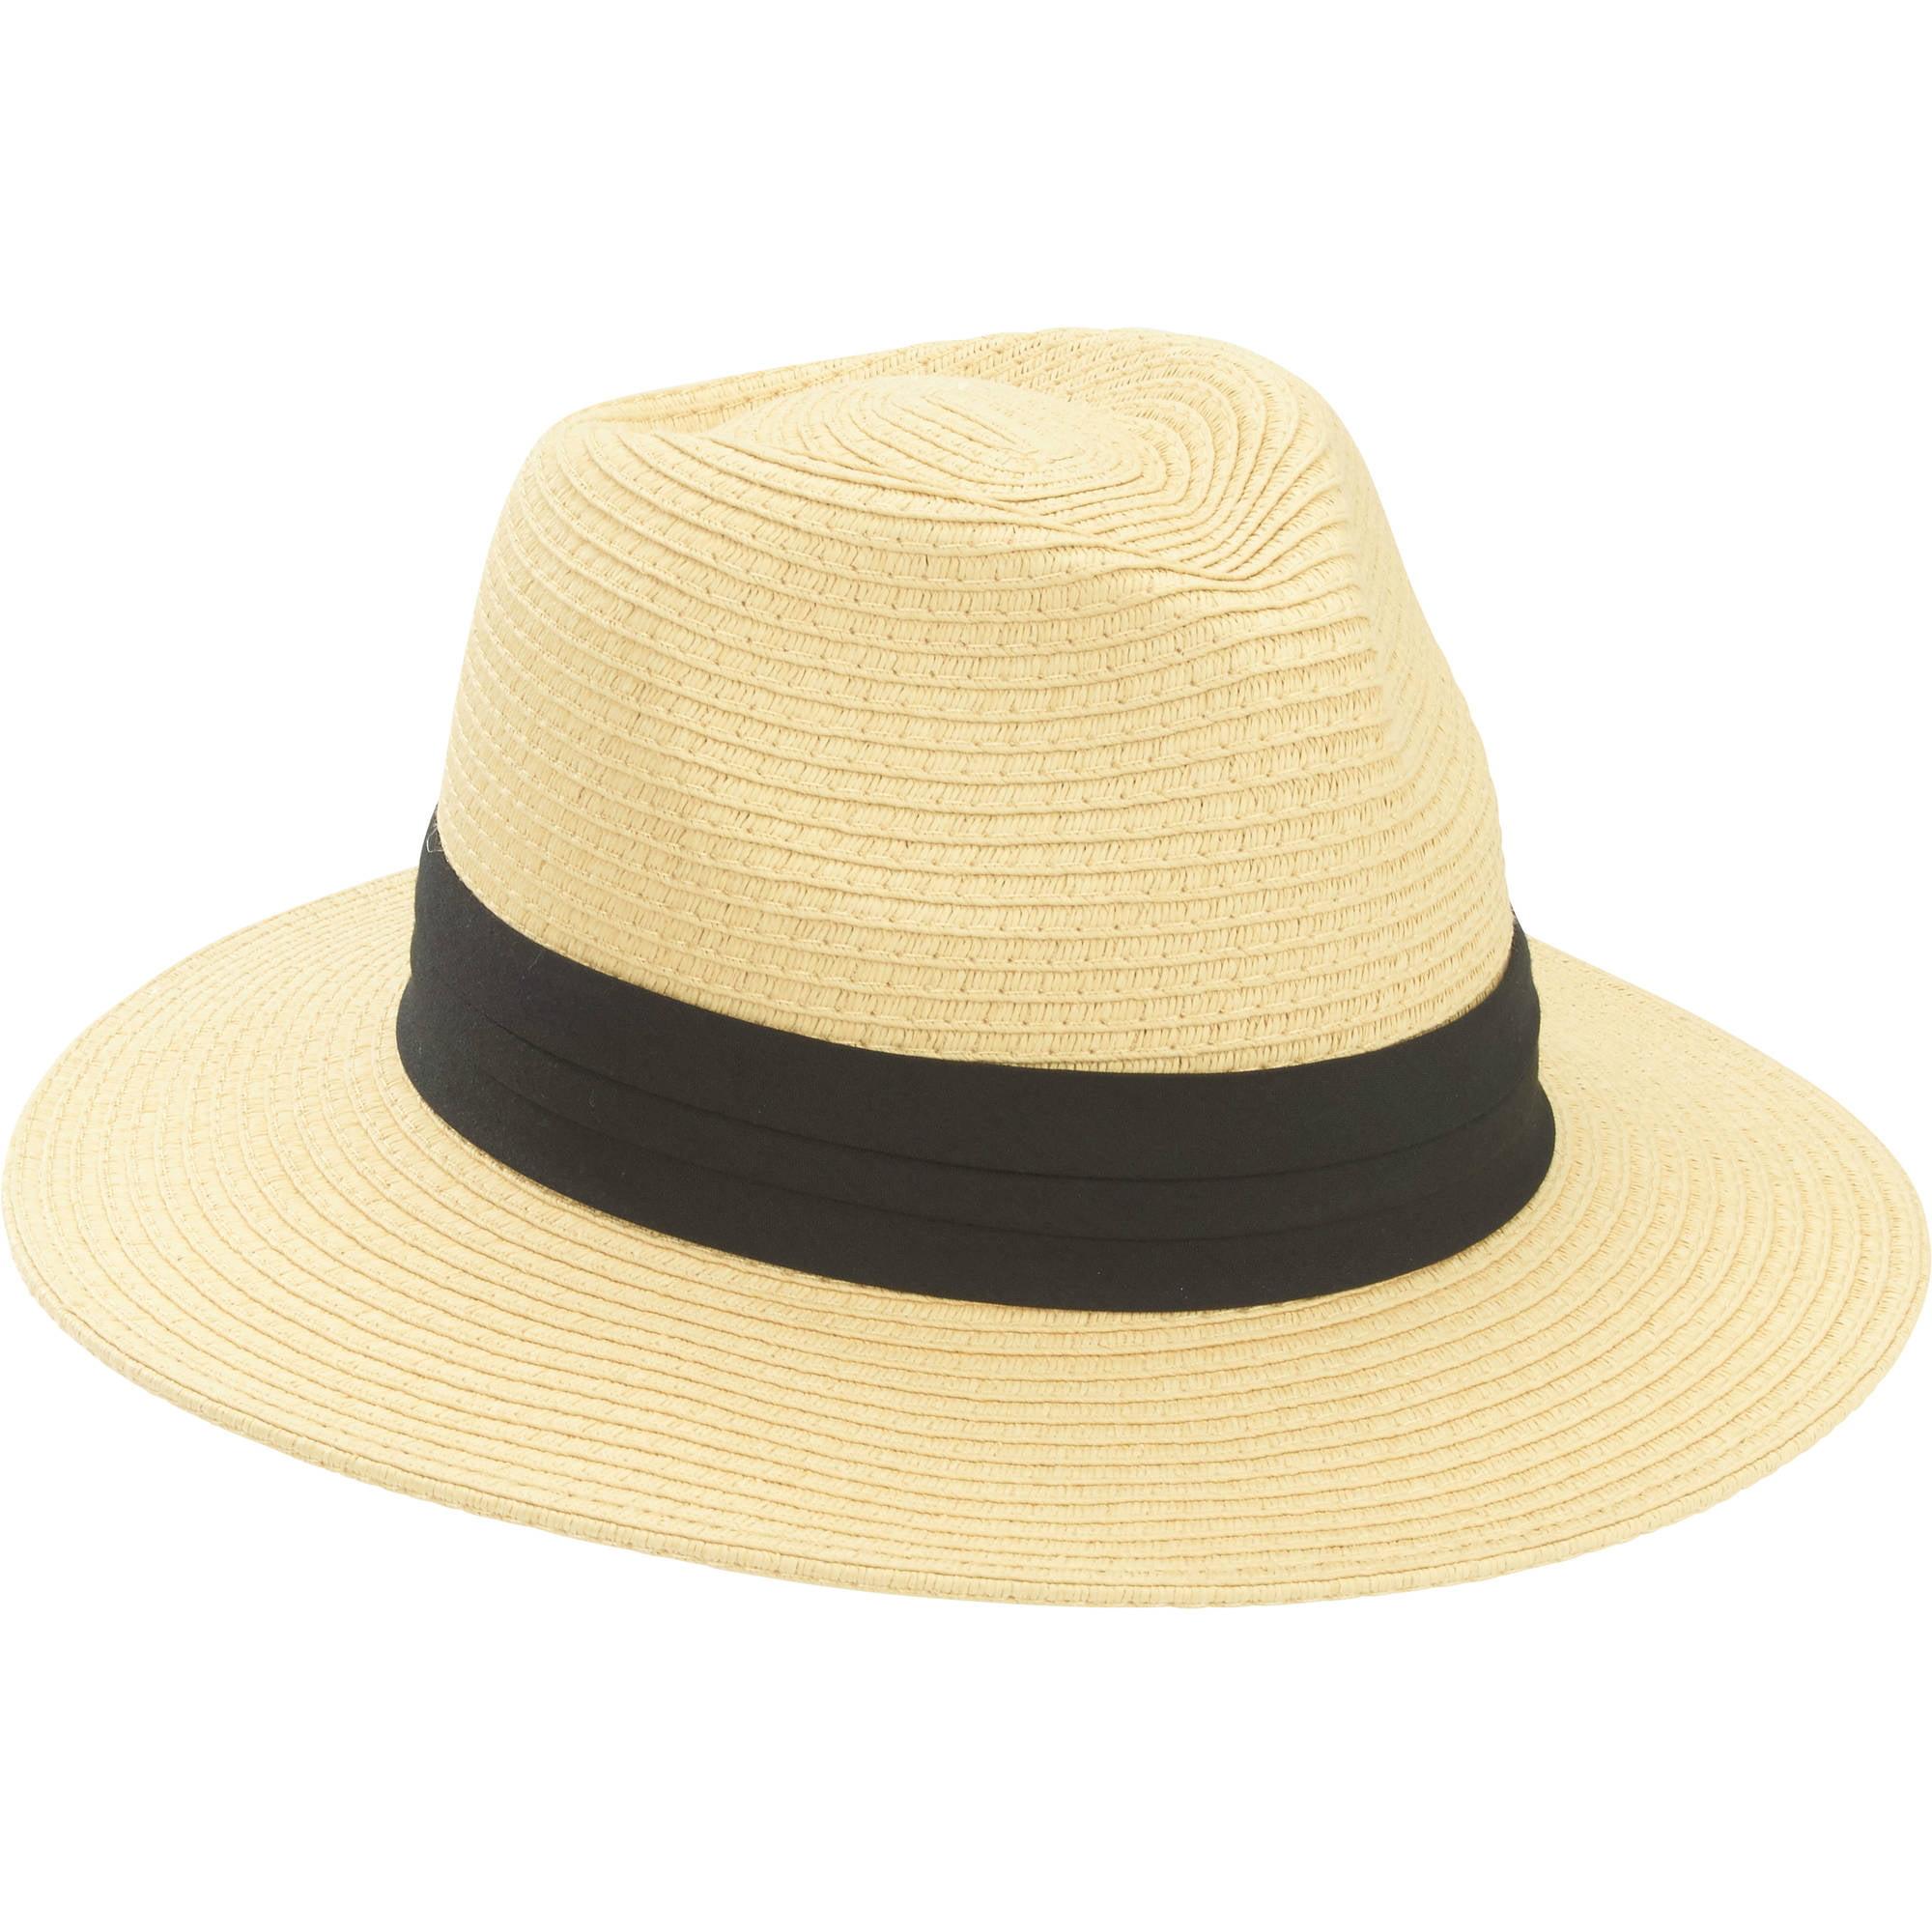 Men's Straw Panama Hat